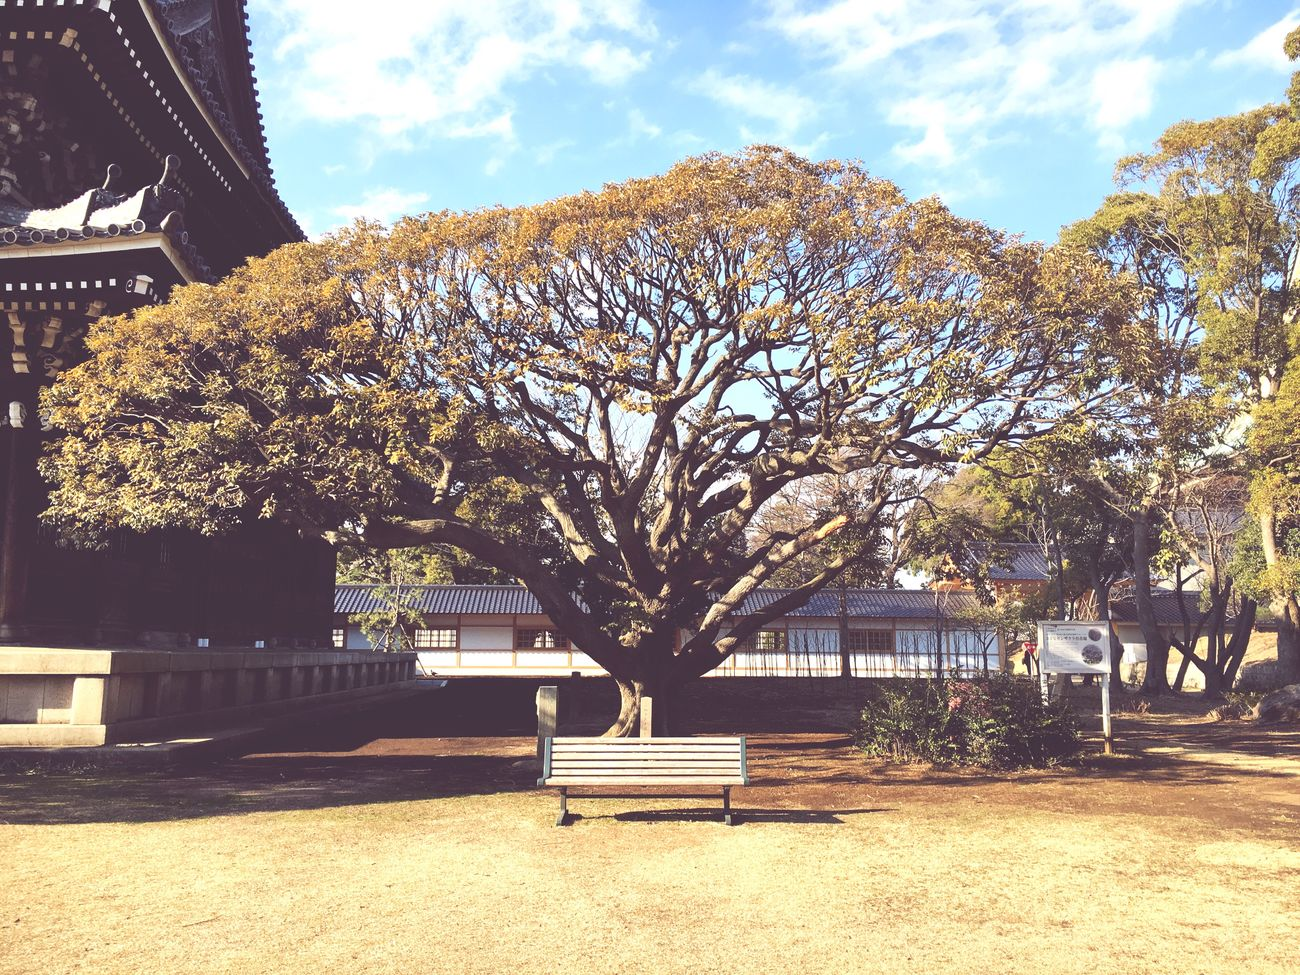 Trees Bench